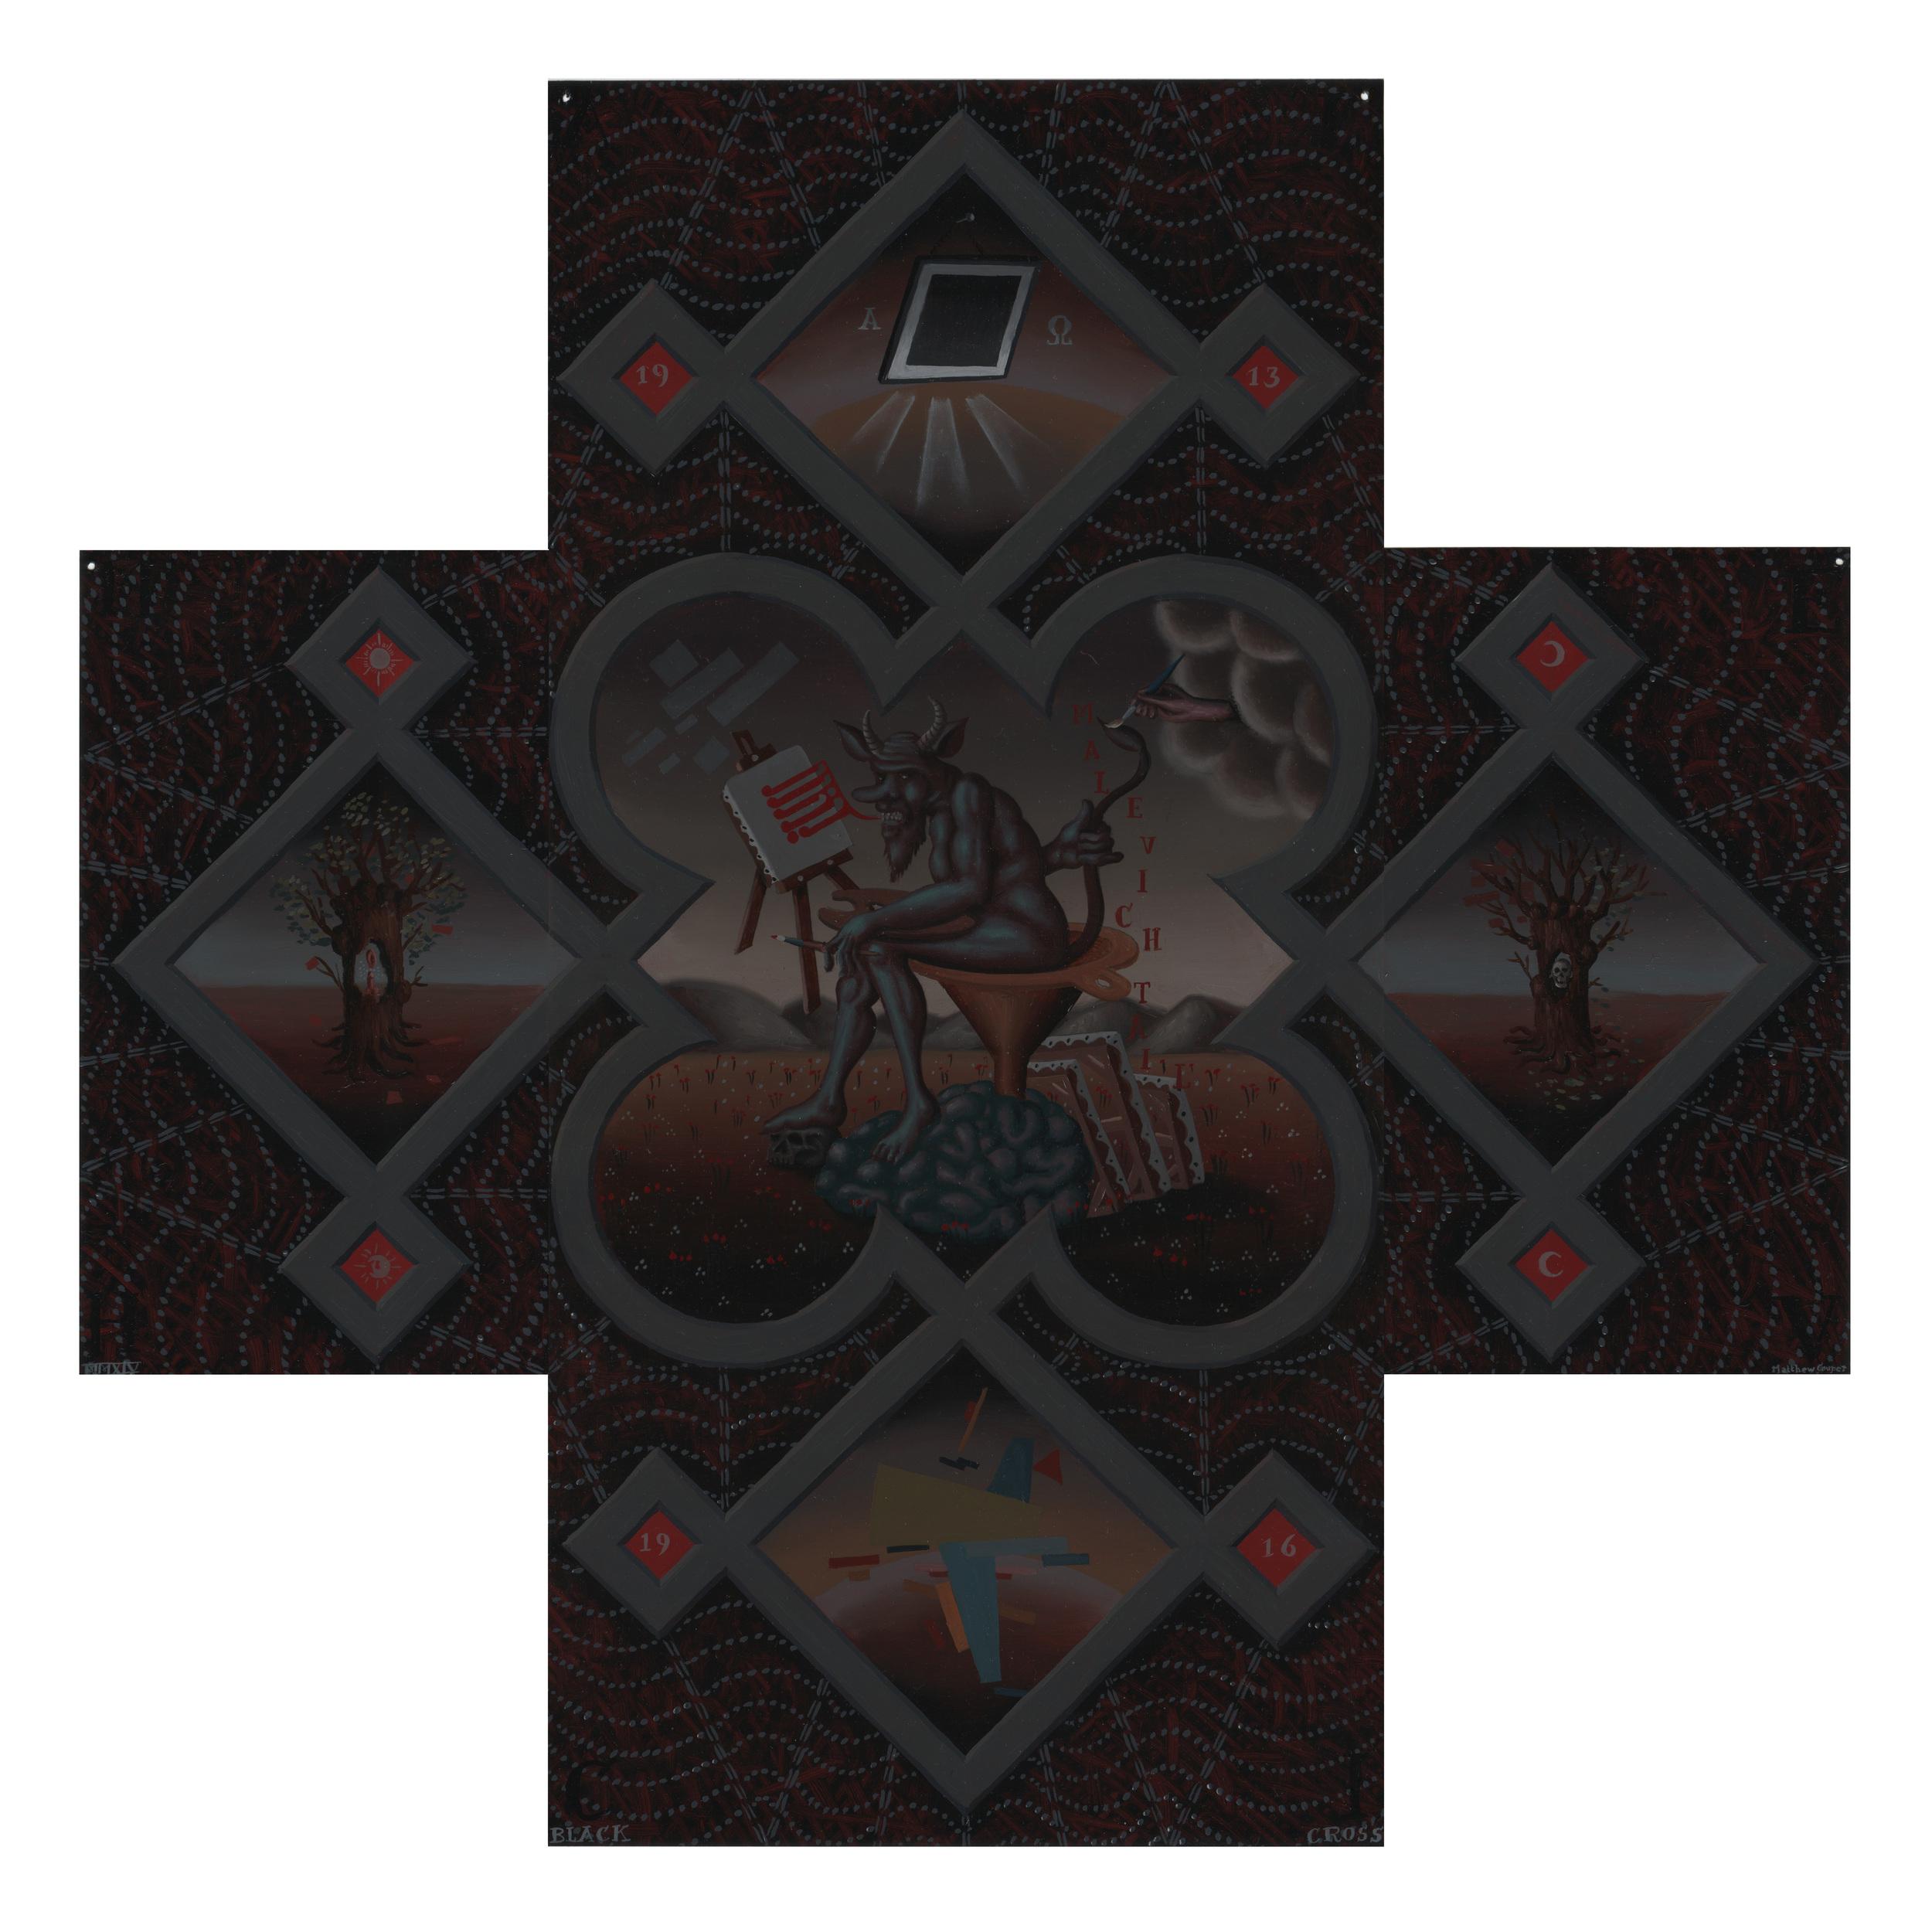 Matthew Couper, Black Cross, 2014, Oil on metal, 55 x 55cm.jpeg